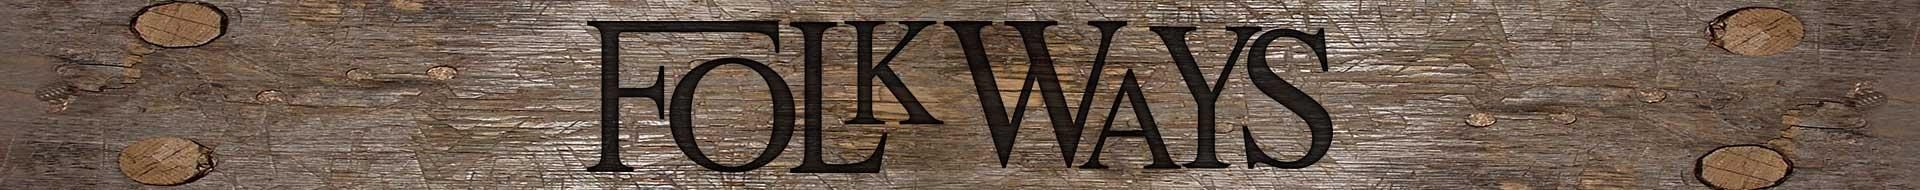 Folkways logo